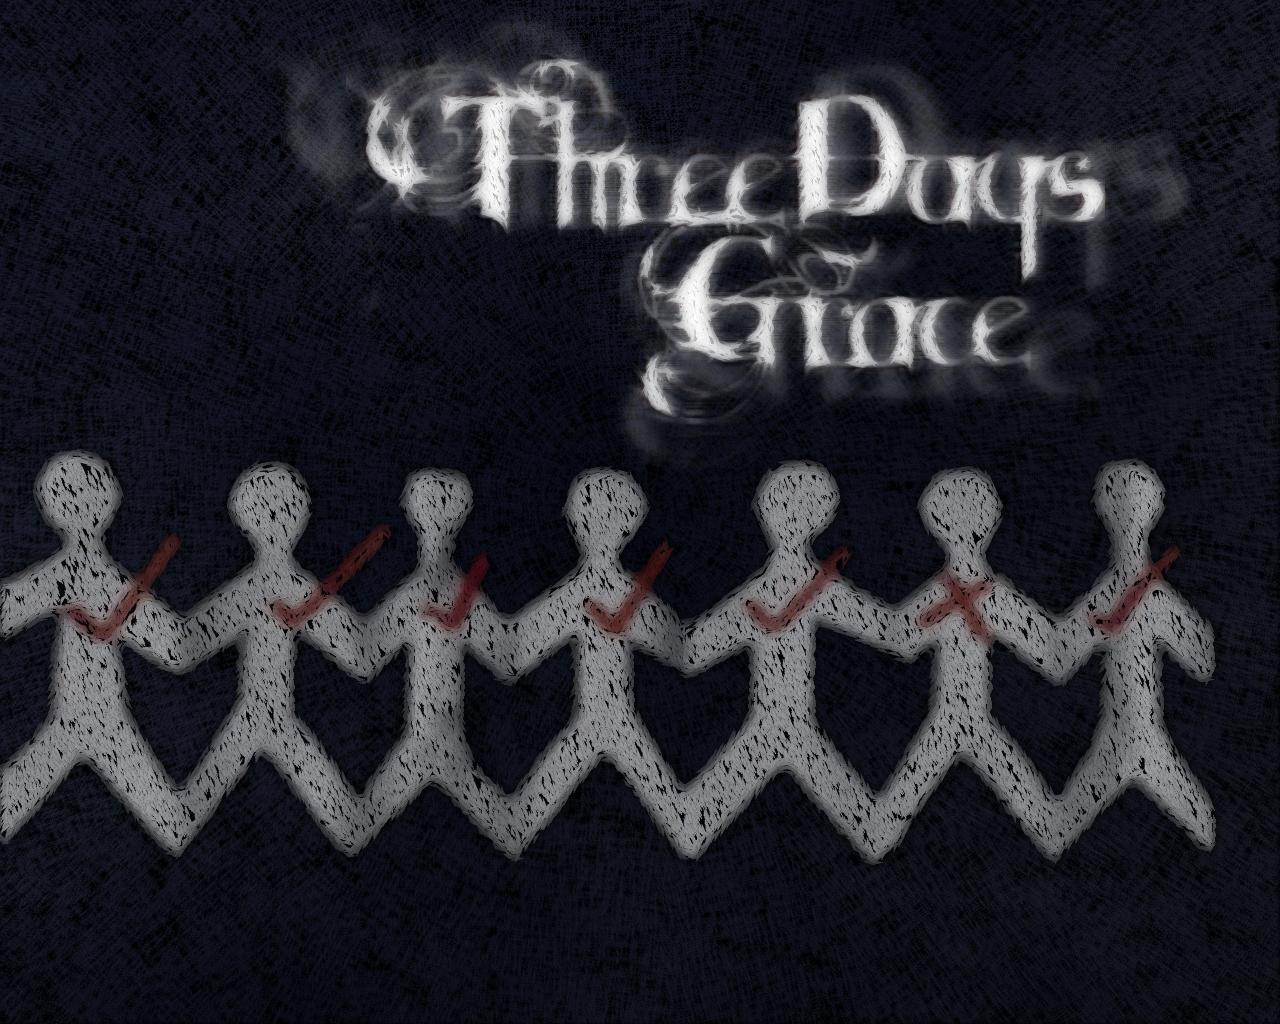 3 days grace   Three Days Grace Wallpaper 29797156 1280x1024